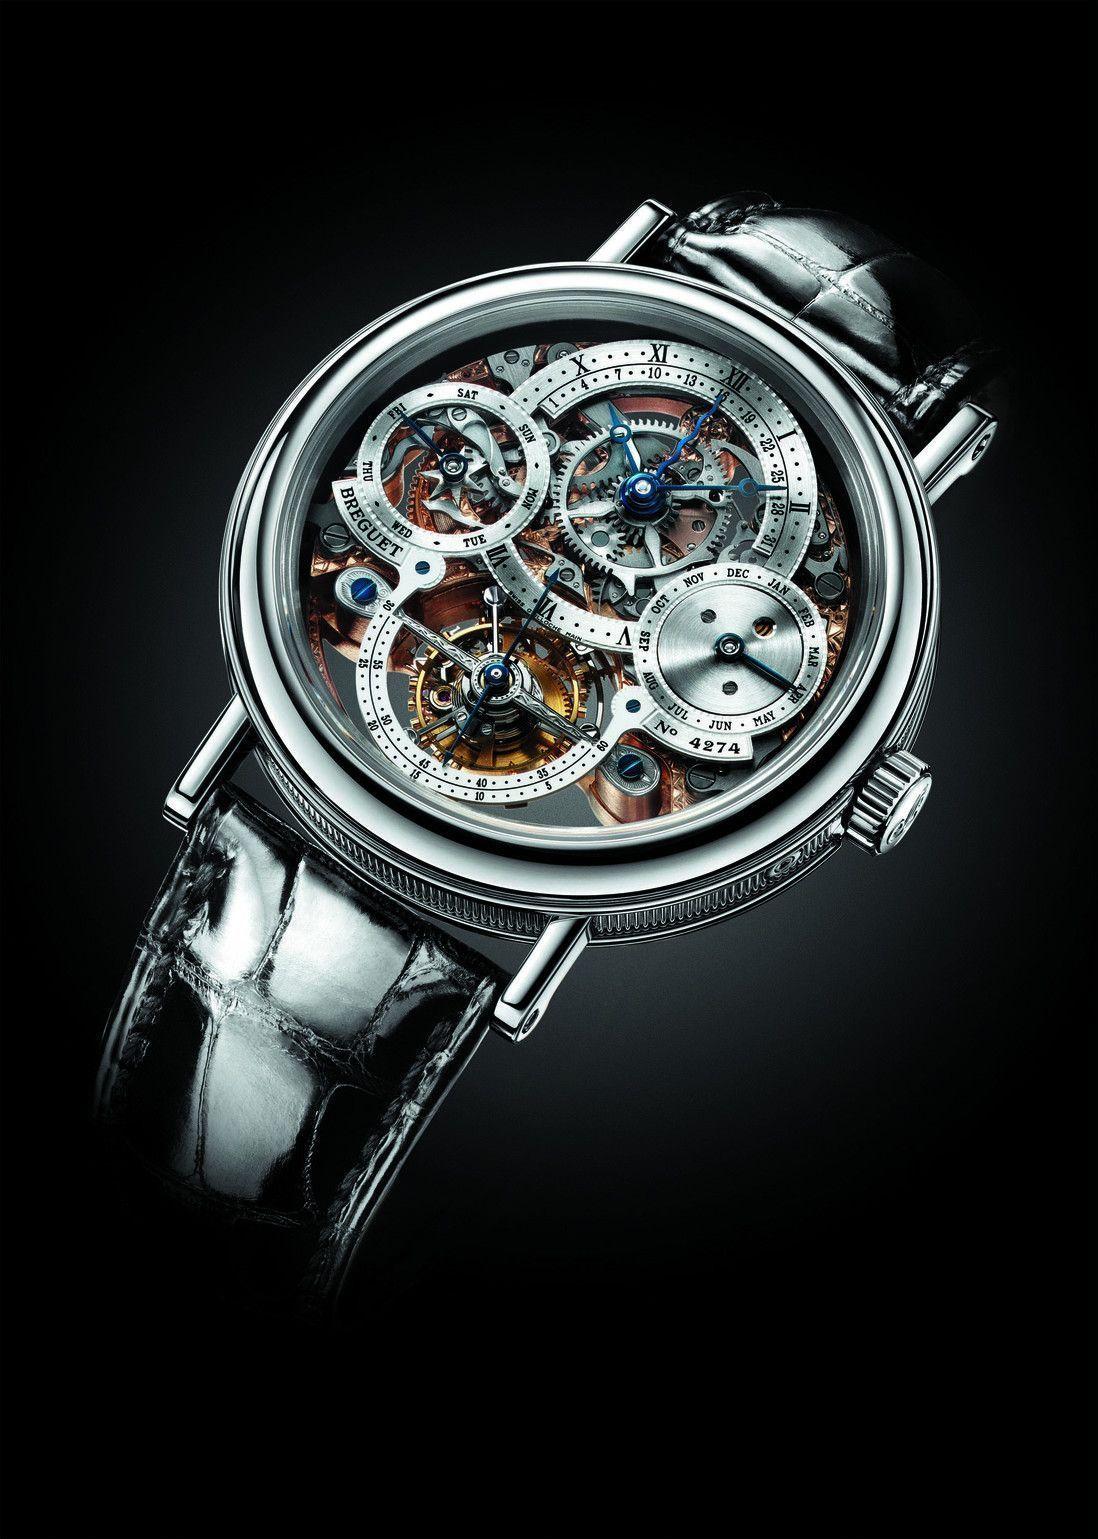 Breguet CLASSIQUE Skeleton tourbillon, Breguet Timepieces